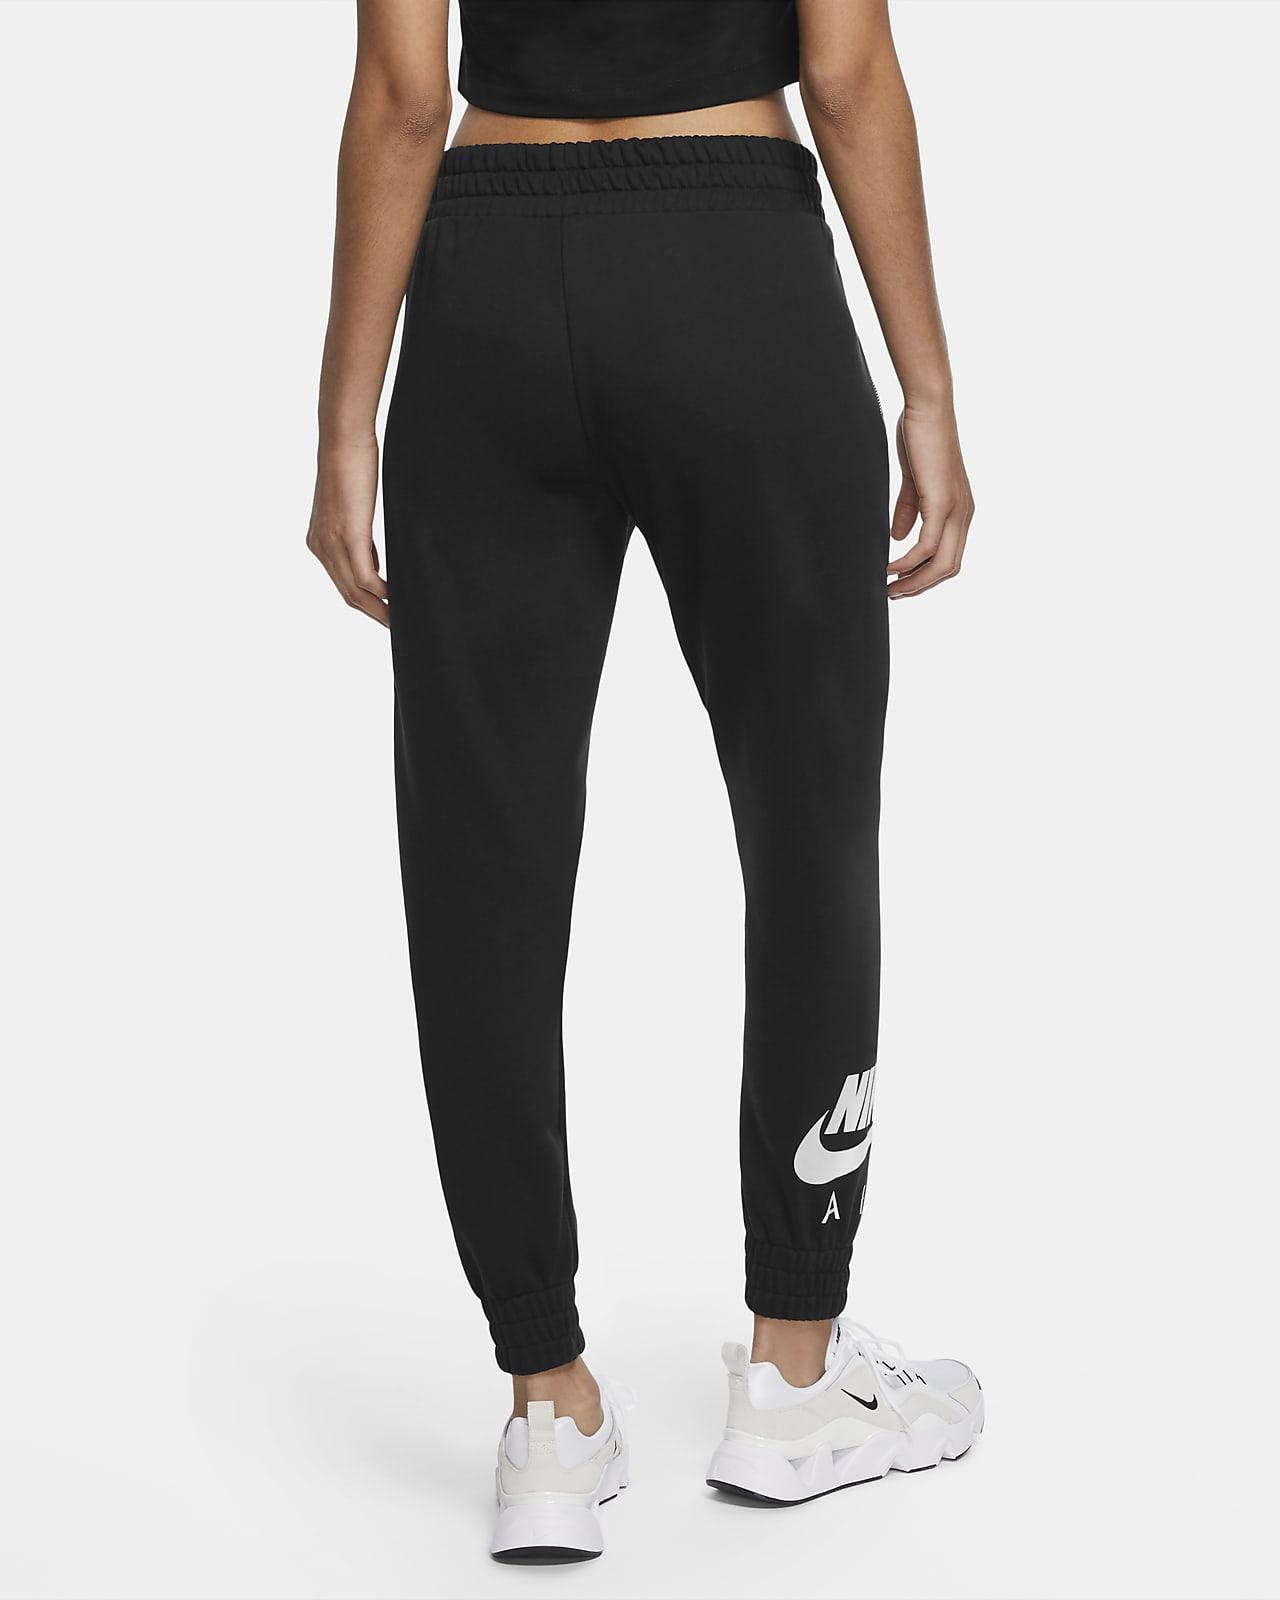 Nike Air fleecebukse til dame. Nike NO